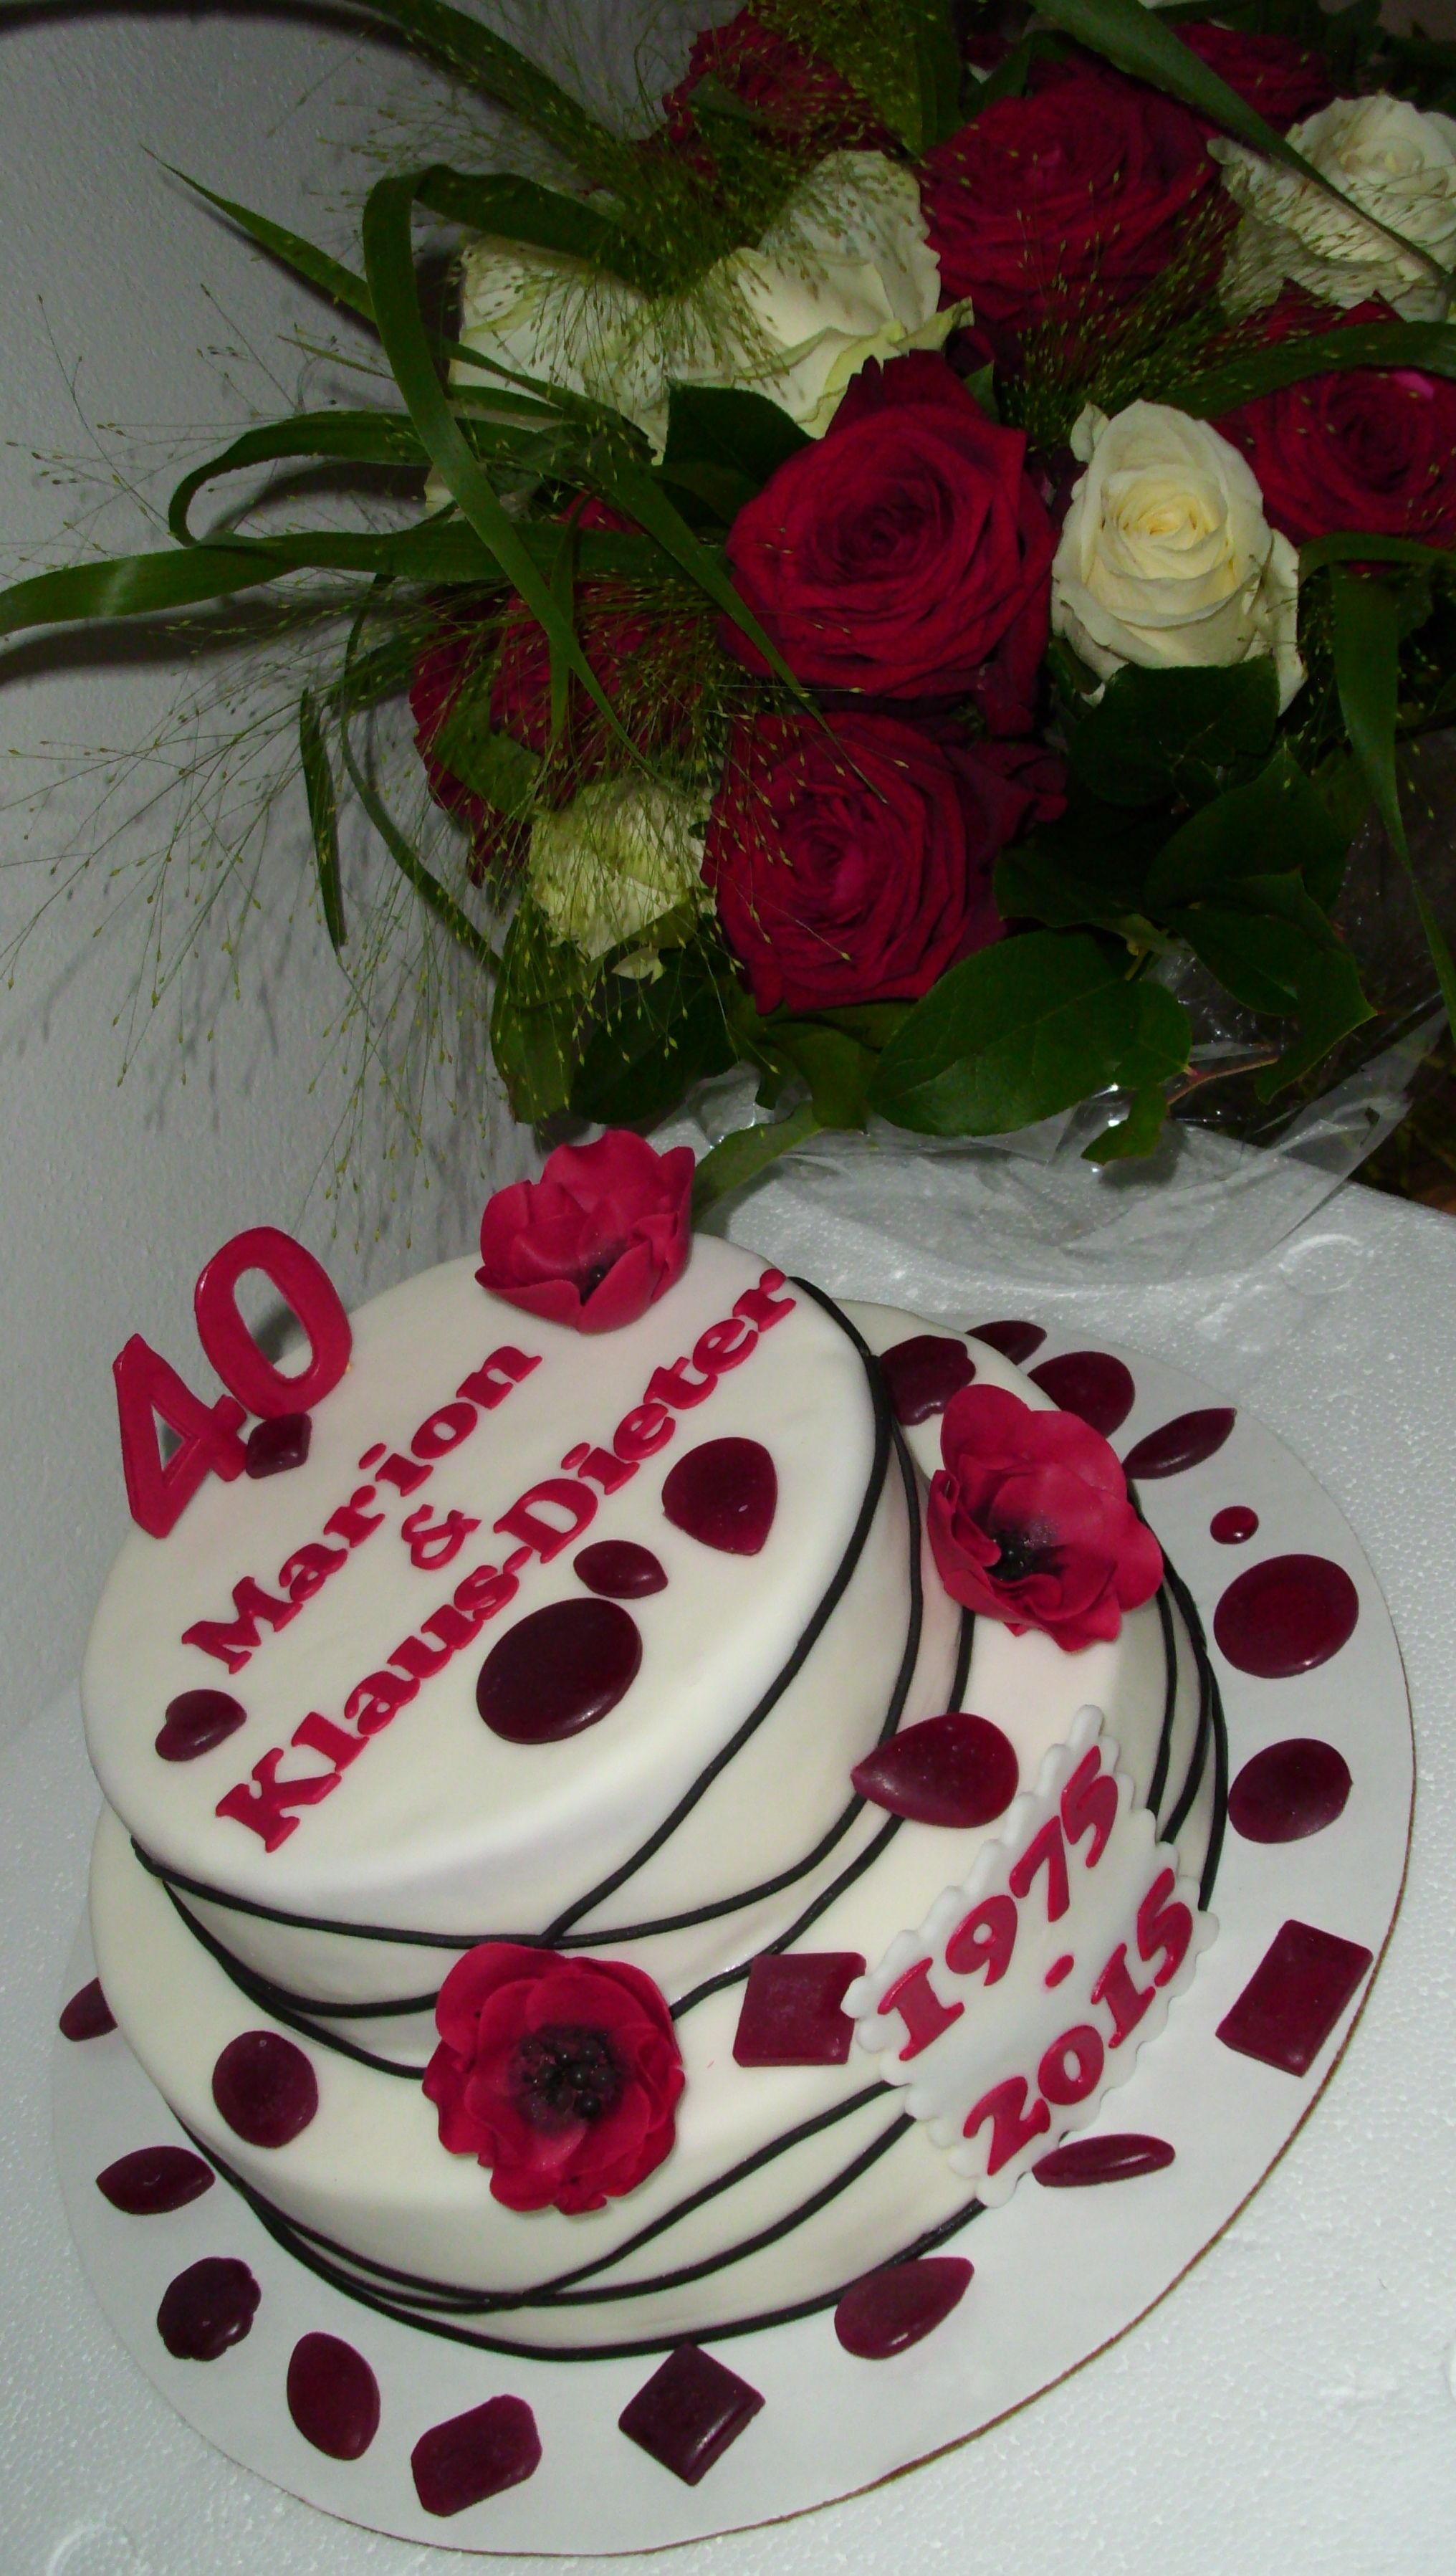 Ruby Wedding Cake Rubinhochzeit Torte Rubinhochzeit Hochzeit Hochzeitstorte Ideen